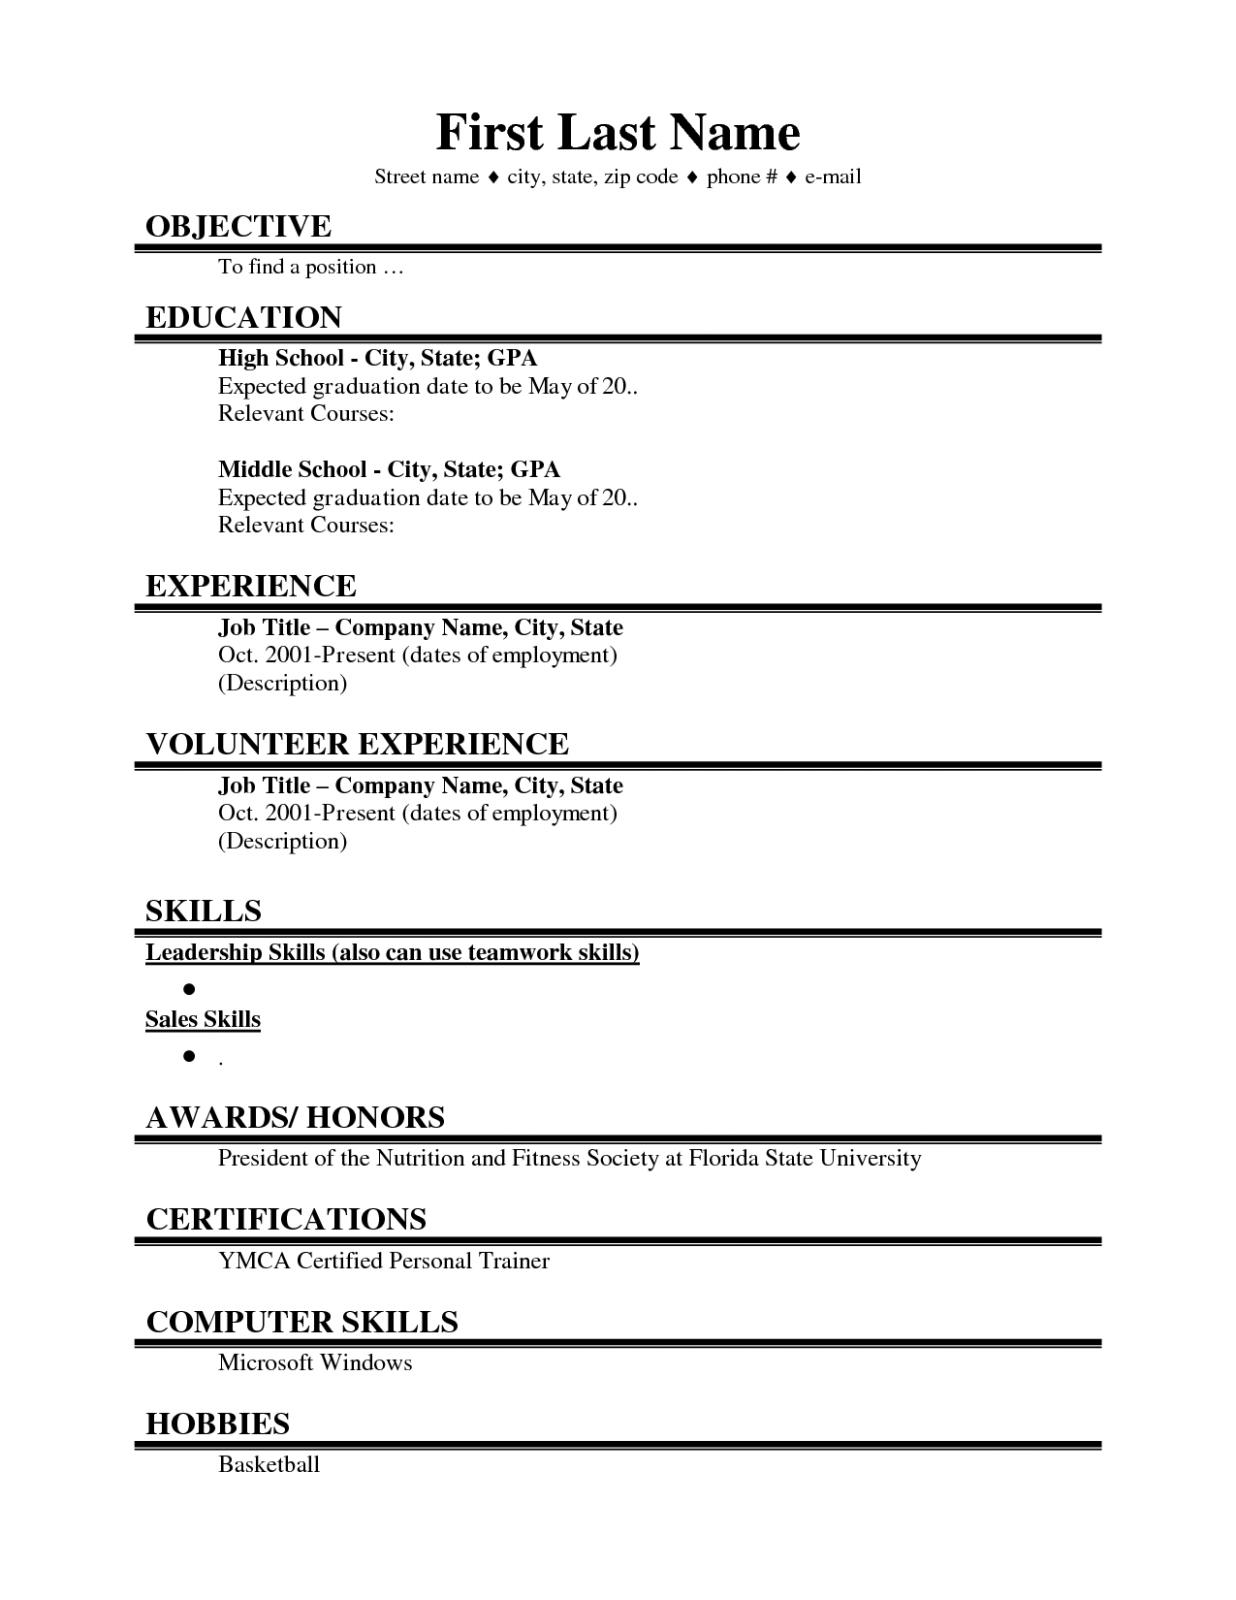 Academic resume sample shows you how to make academic